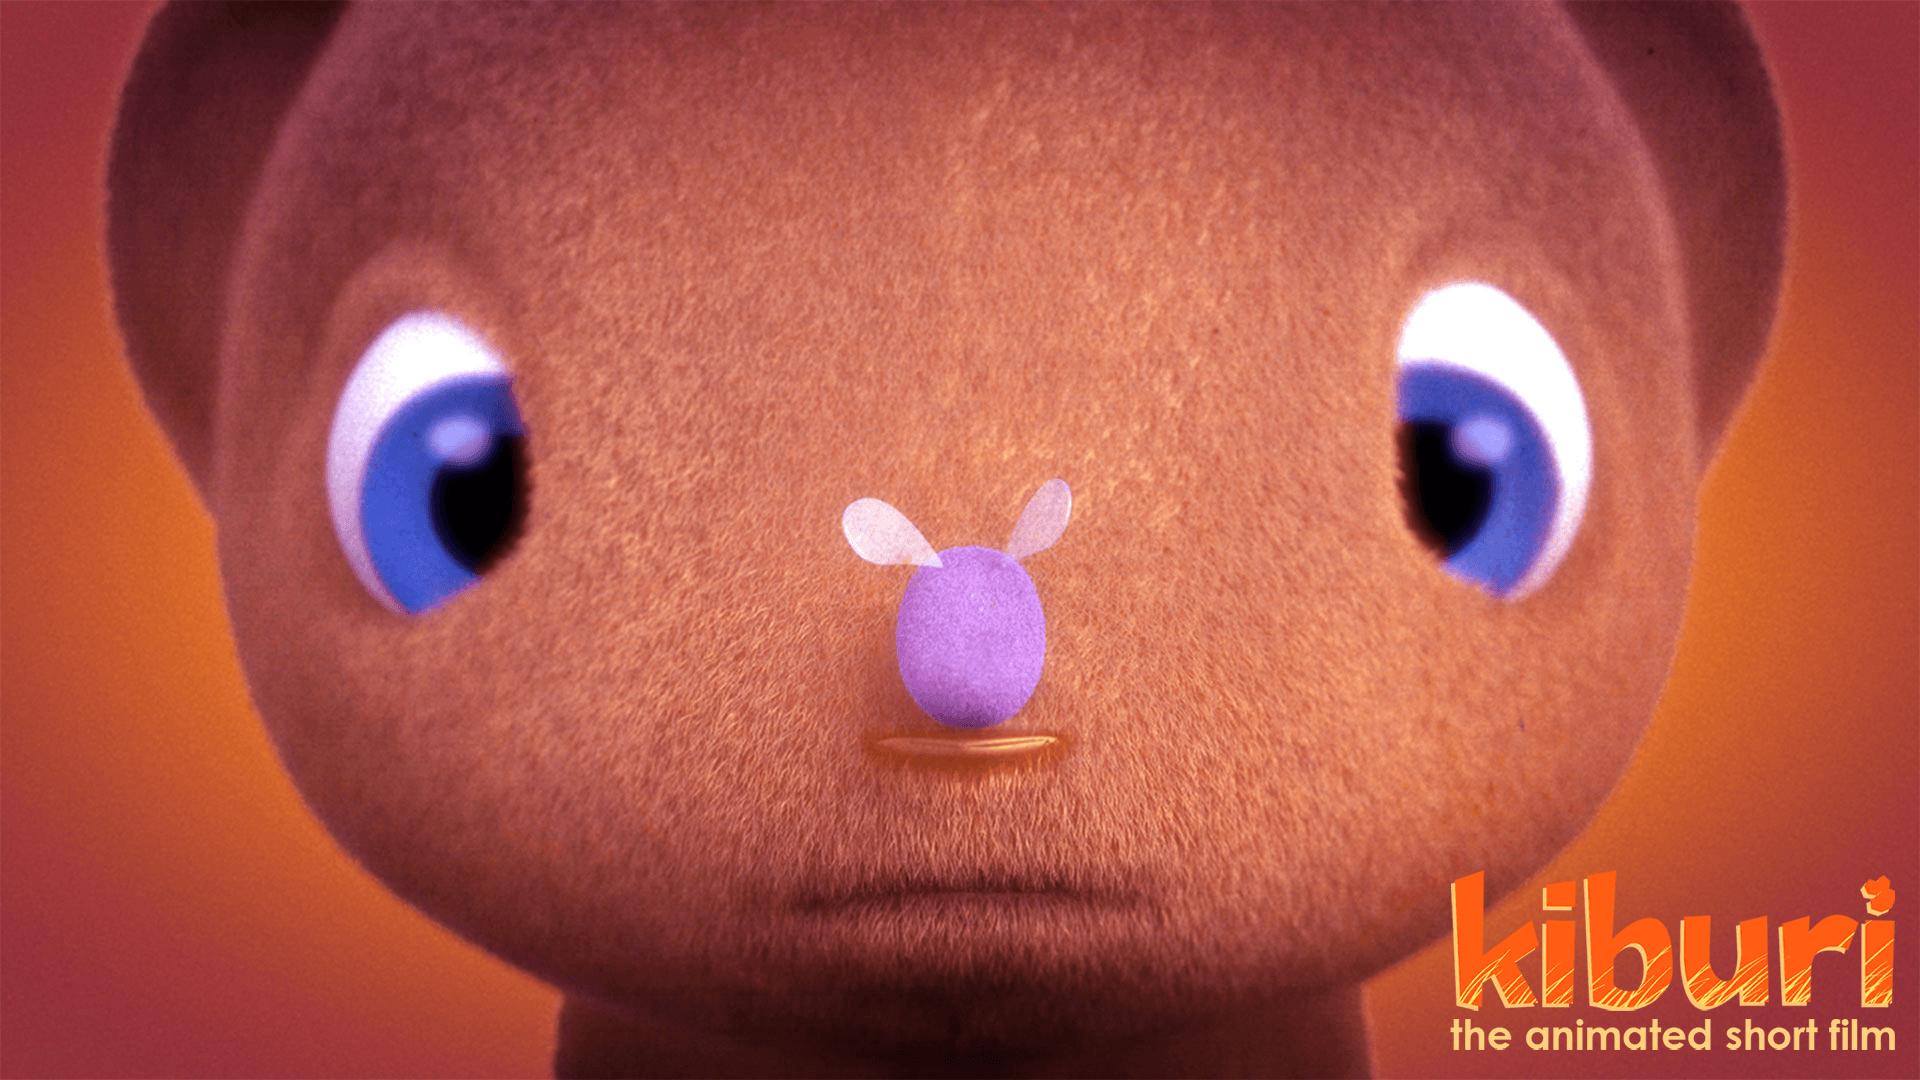 Kiburi the Animated Short Film